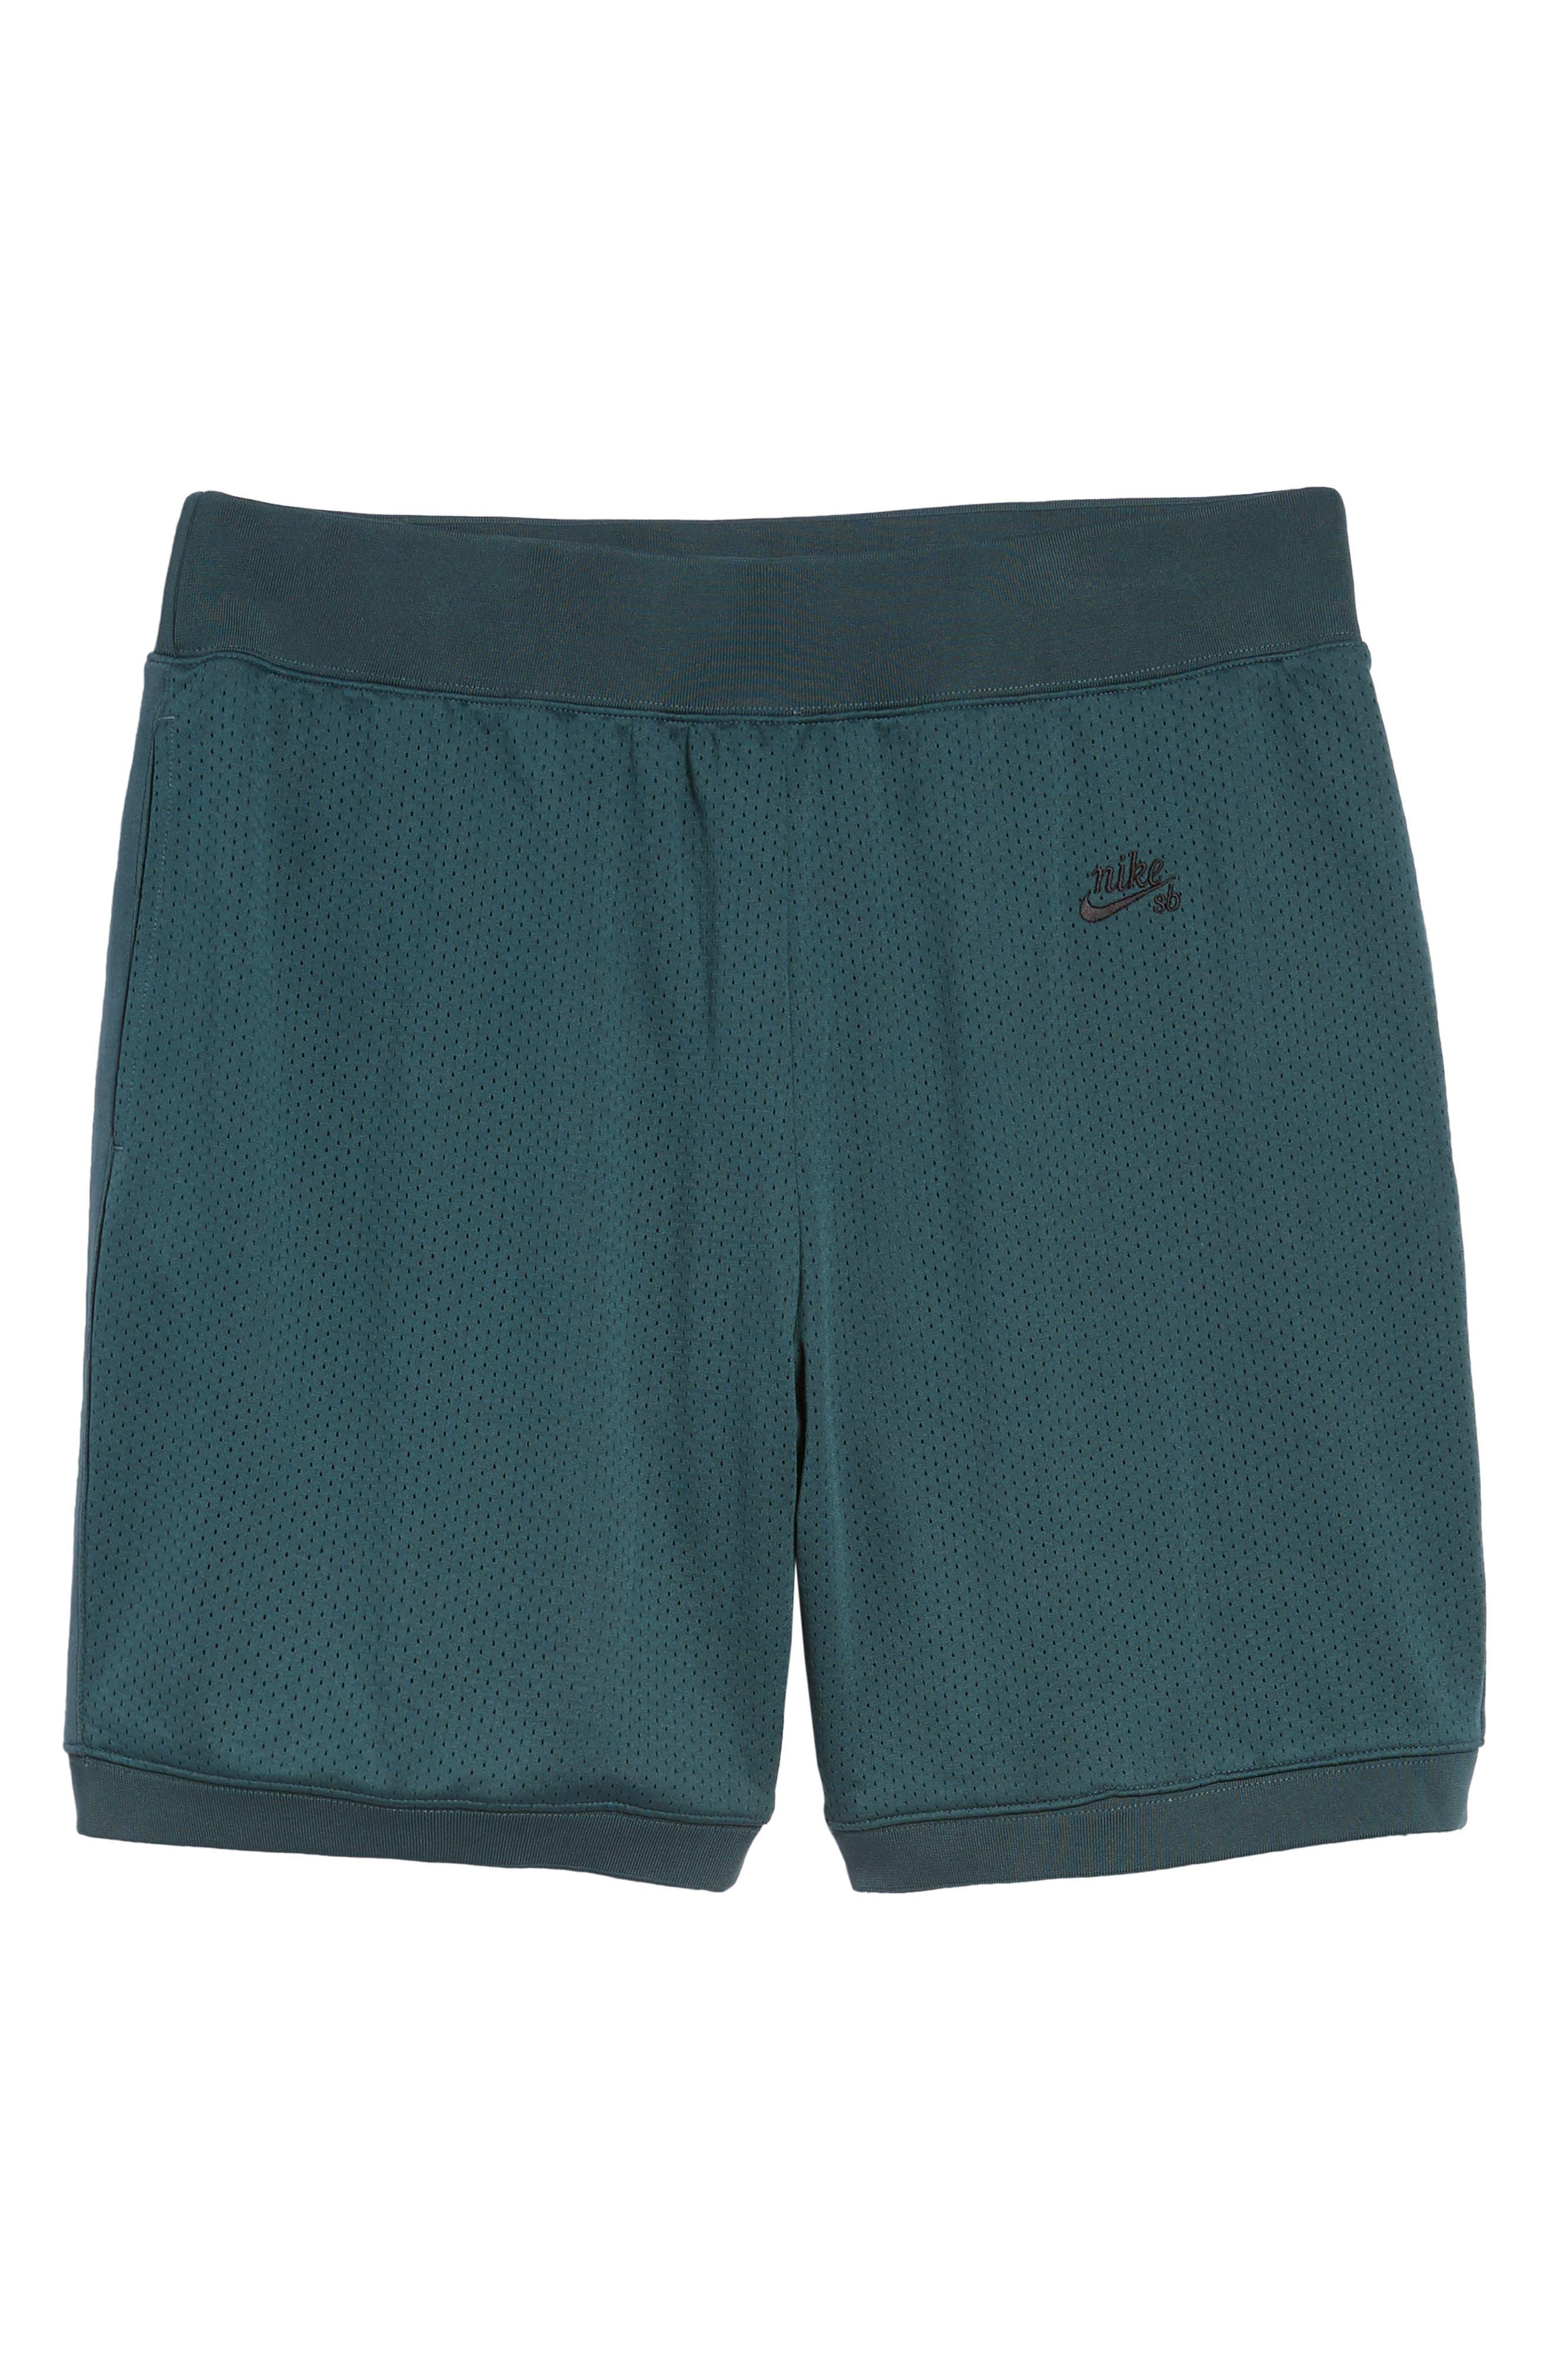 SB Dry Heritage Court Shorts,                             Alternate thumbnail 6, color,                             DEEP JUNGLE/ BLACK